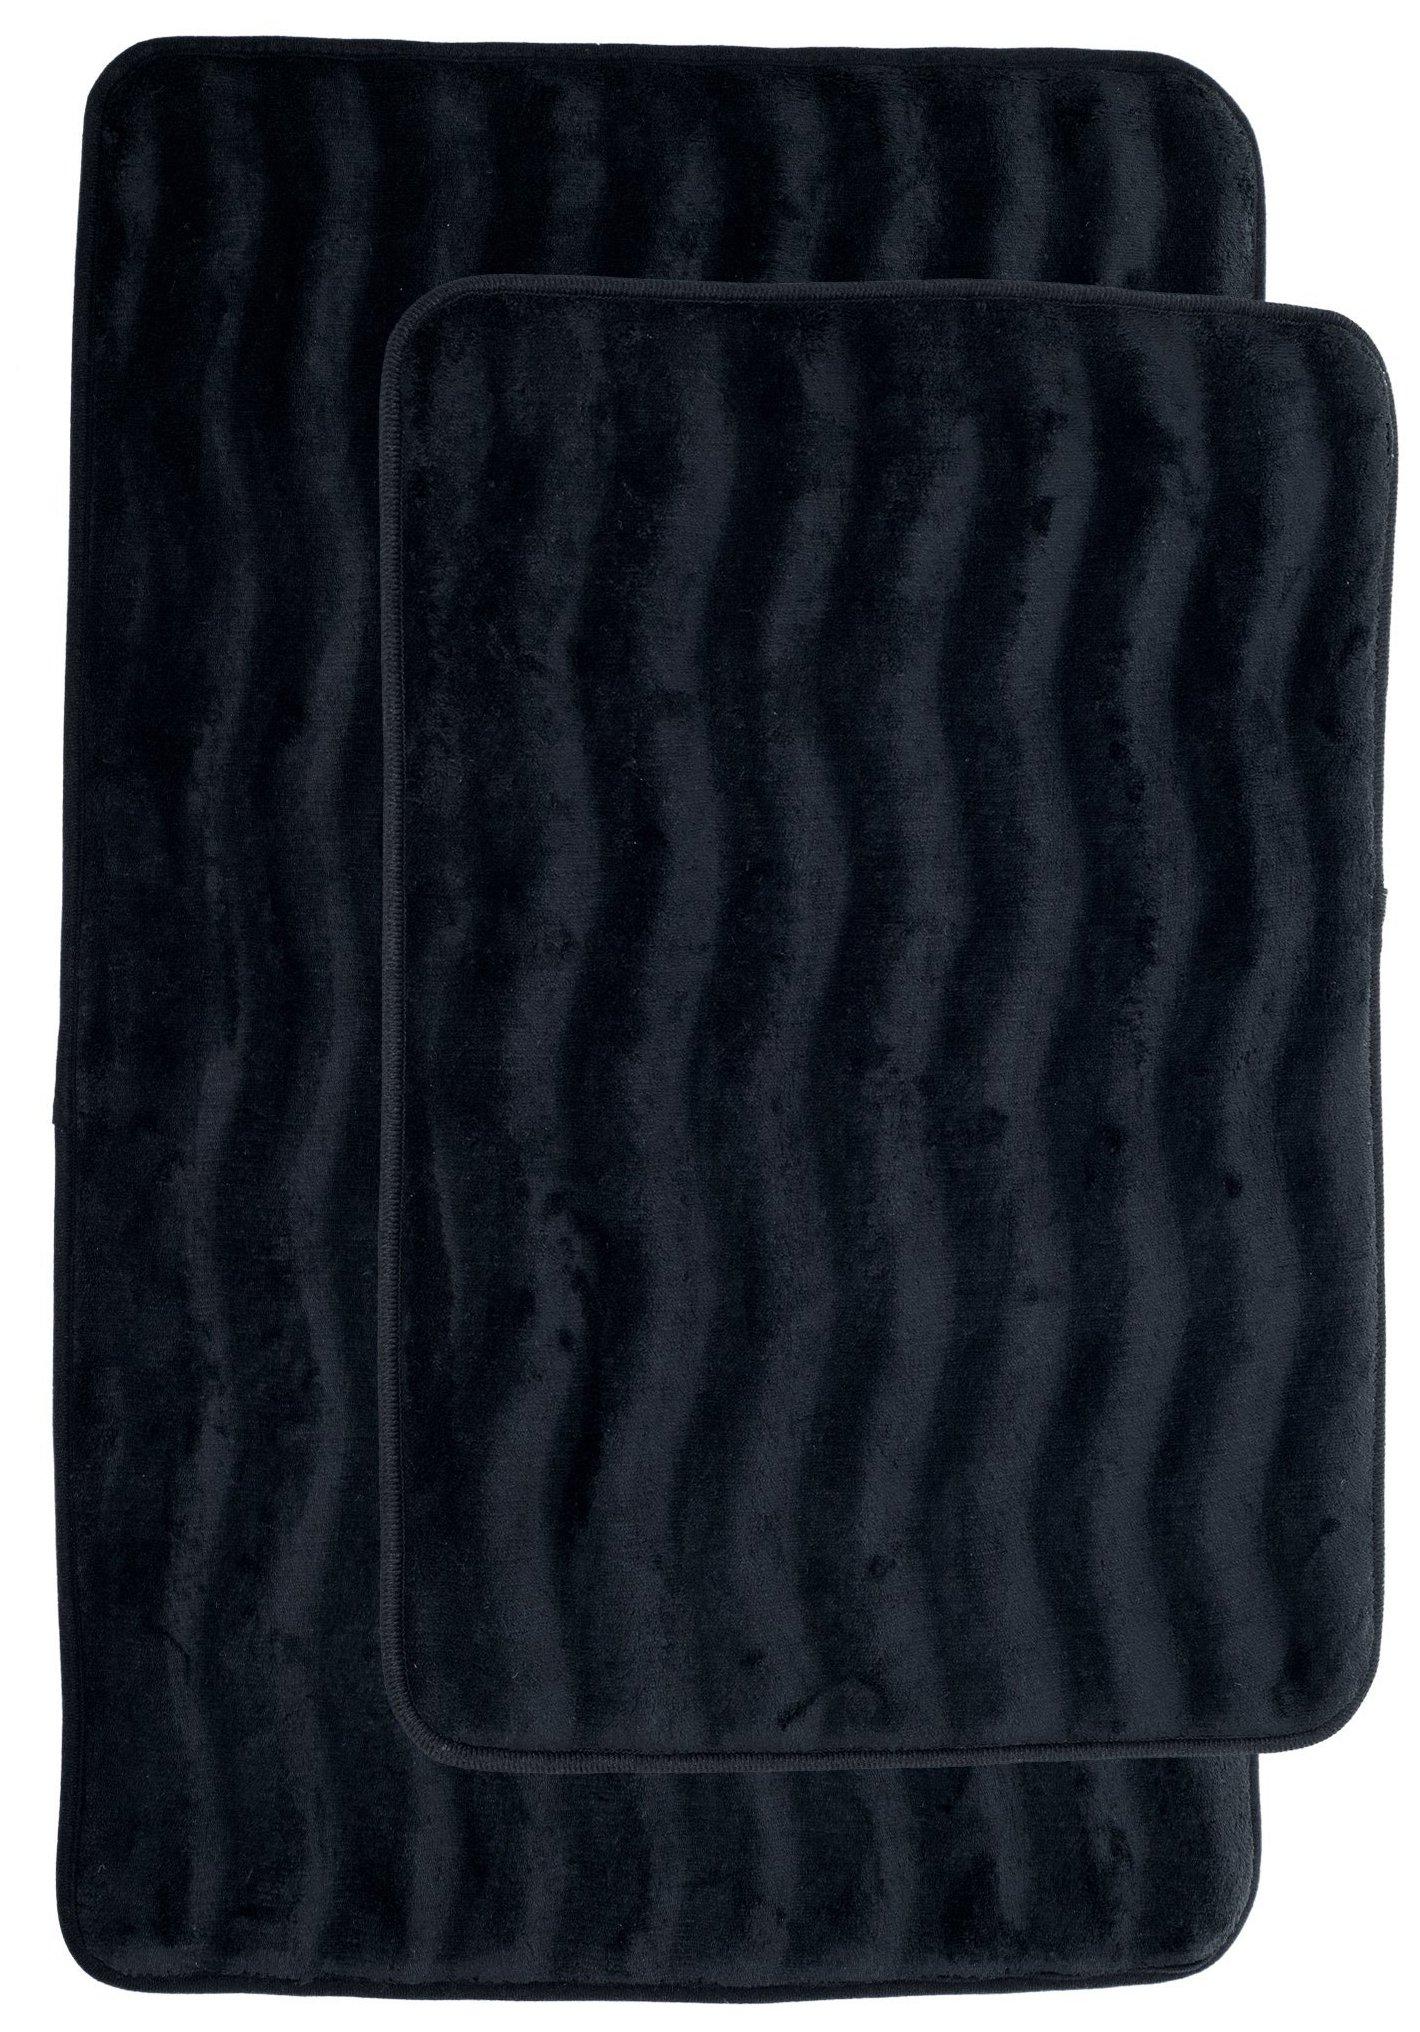 Lavish Home 2 Piece Memory Foam Bath Mat, Black